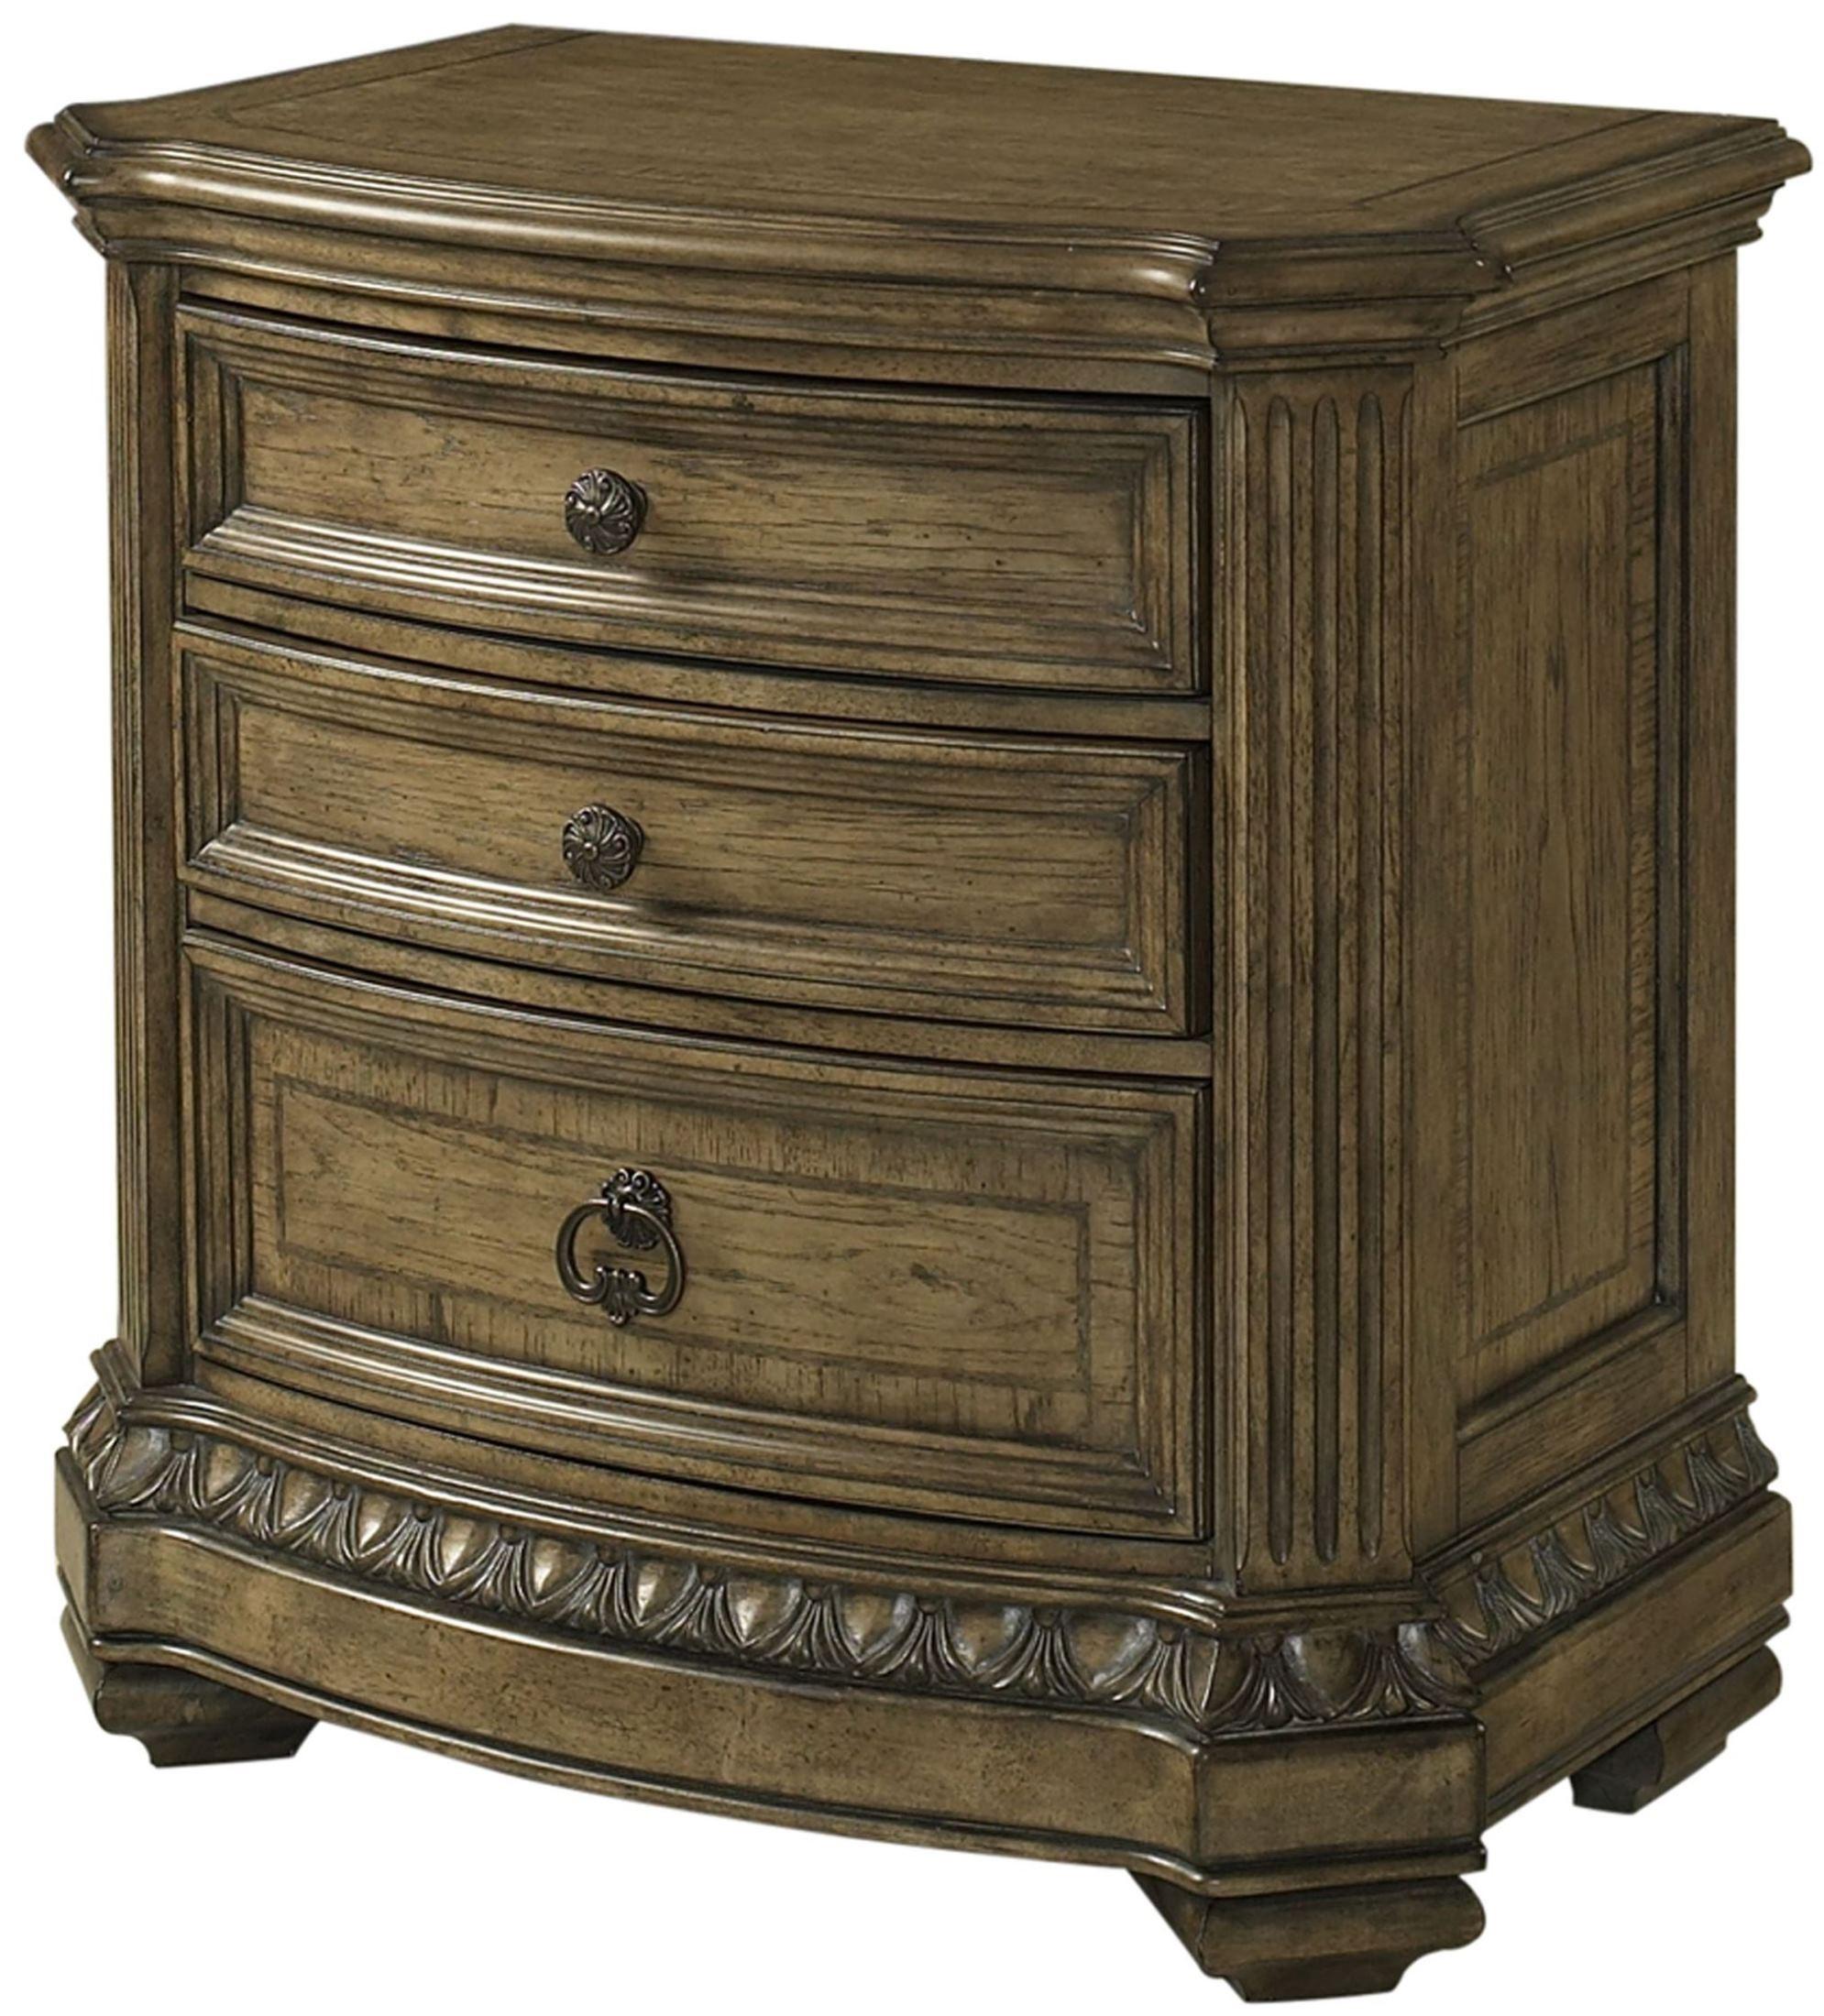 Touraine French Glazed Pecan Sleigh Bedroom Set S7154 63 64 58 Fairmont Designs